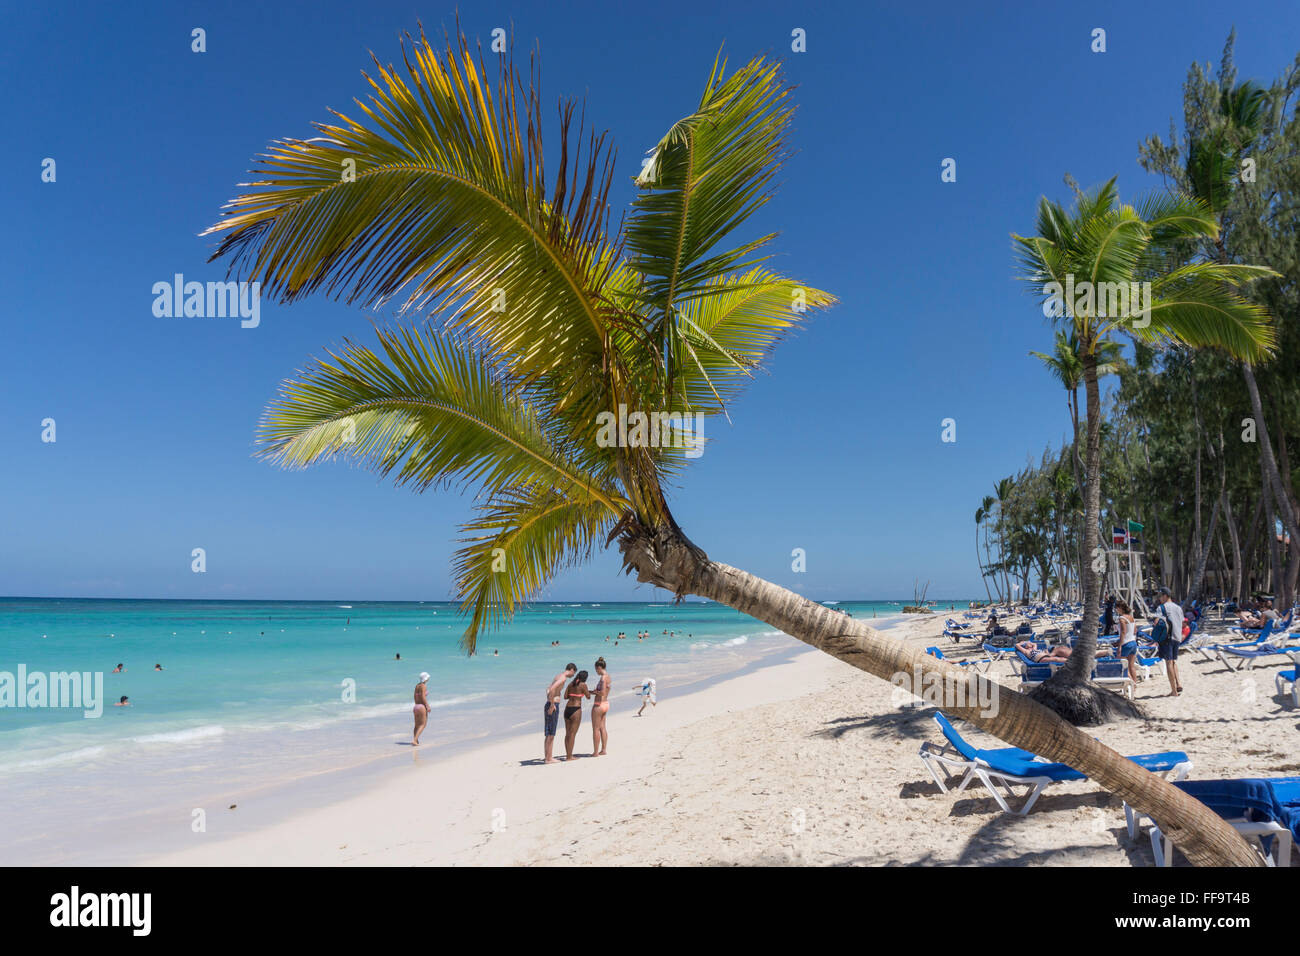 Palm beach, Playa Bavaro, Punta Cana, République dominicaine, Caraïbes Photo Stock